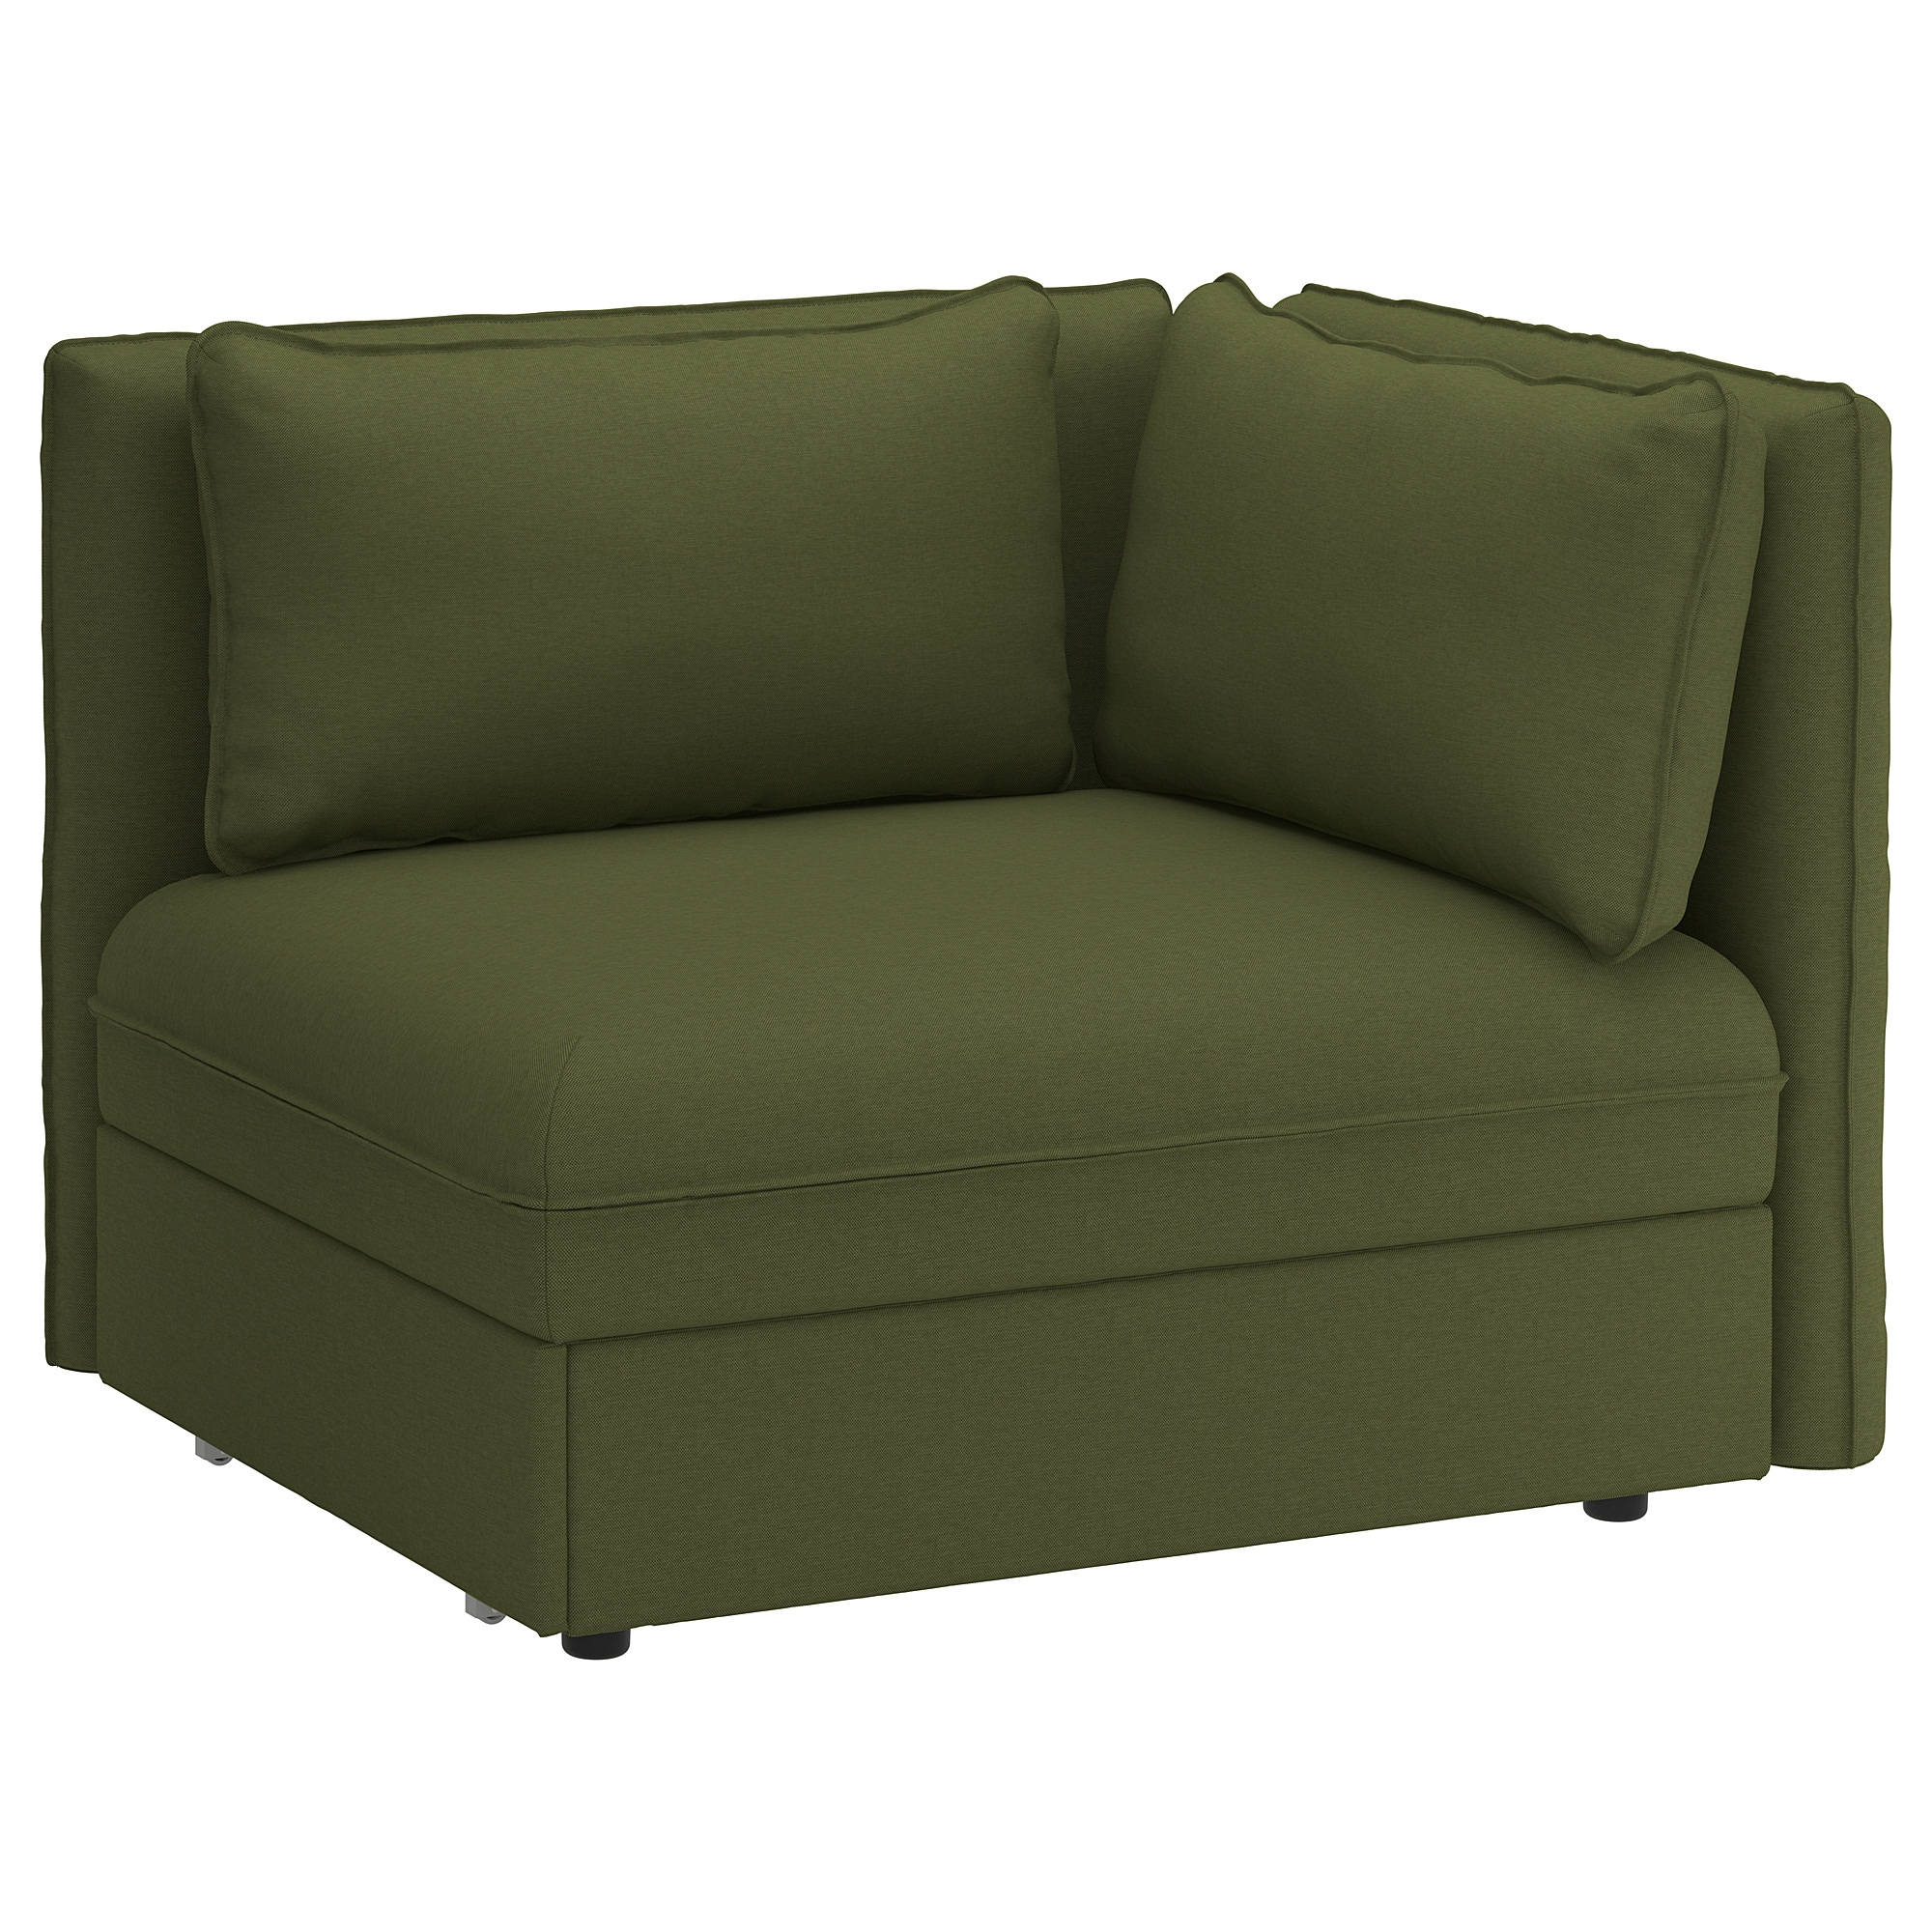 Ikea sofas Cama Txdf Vallentuna Mà Dulo sofà Cama Con Reposabrazos orrsta Verde Oliva Ikea